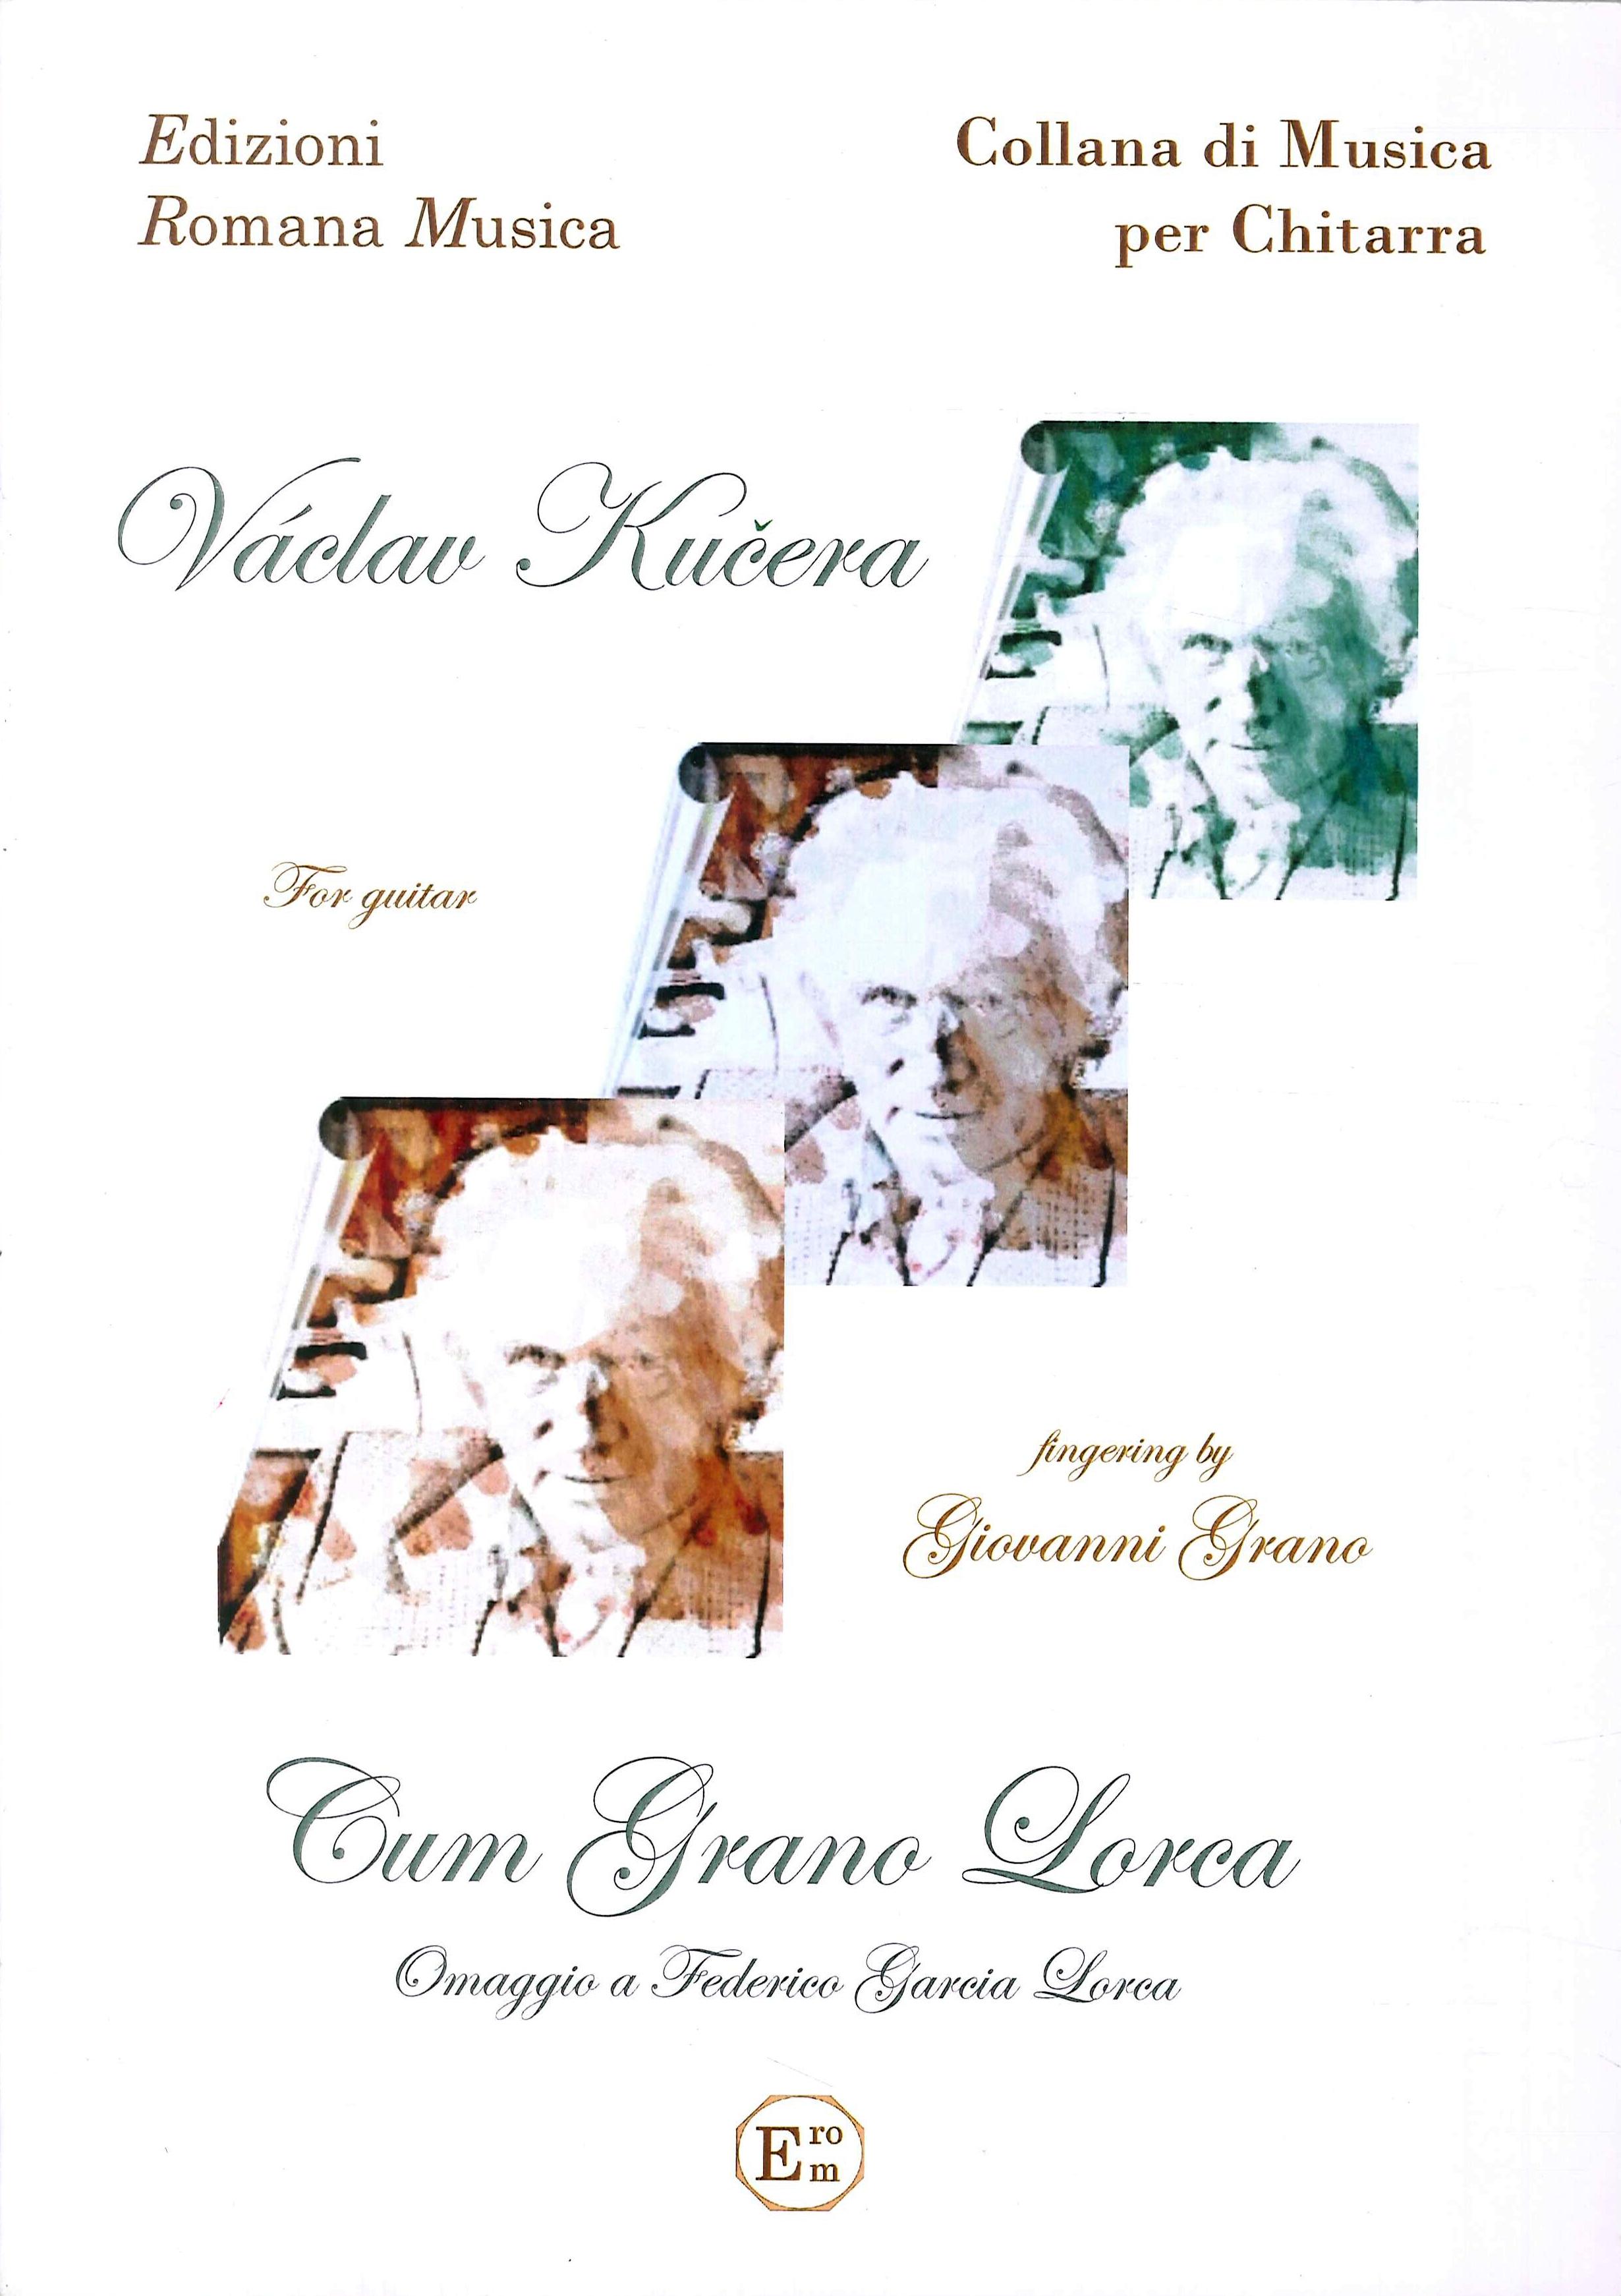 Vaclav Kucera. Cum Grano Lorca. Musica per Chitarra. For Guitar. Erom 0022en.